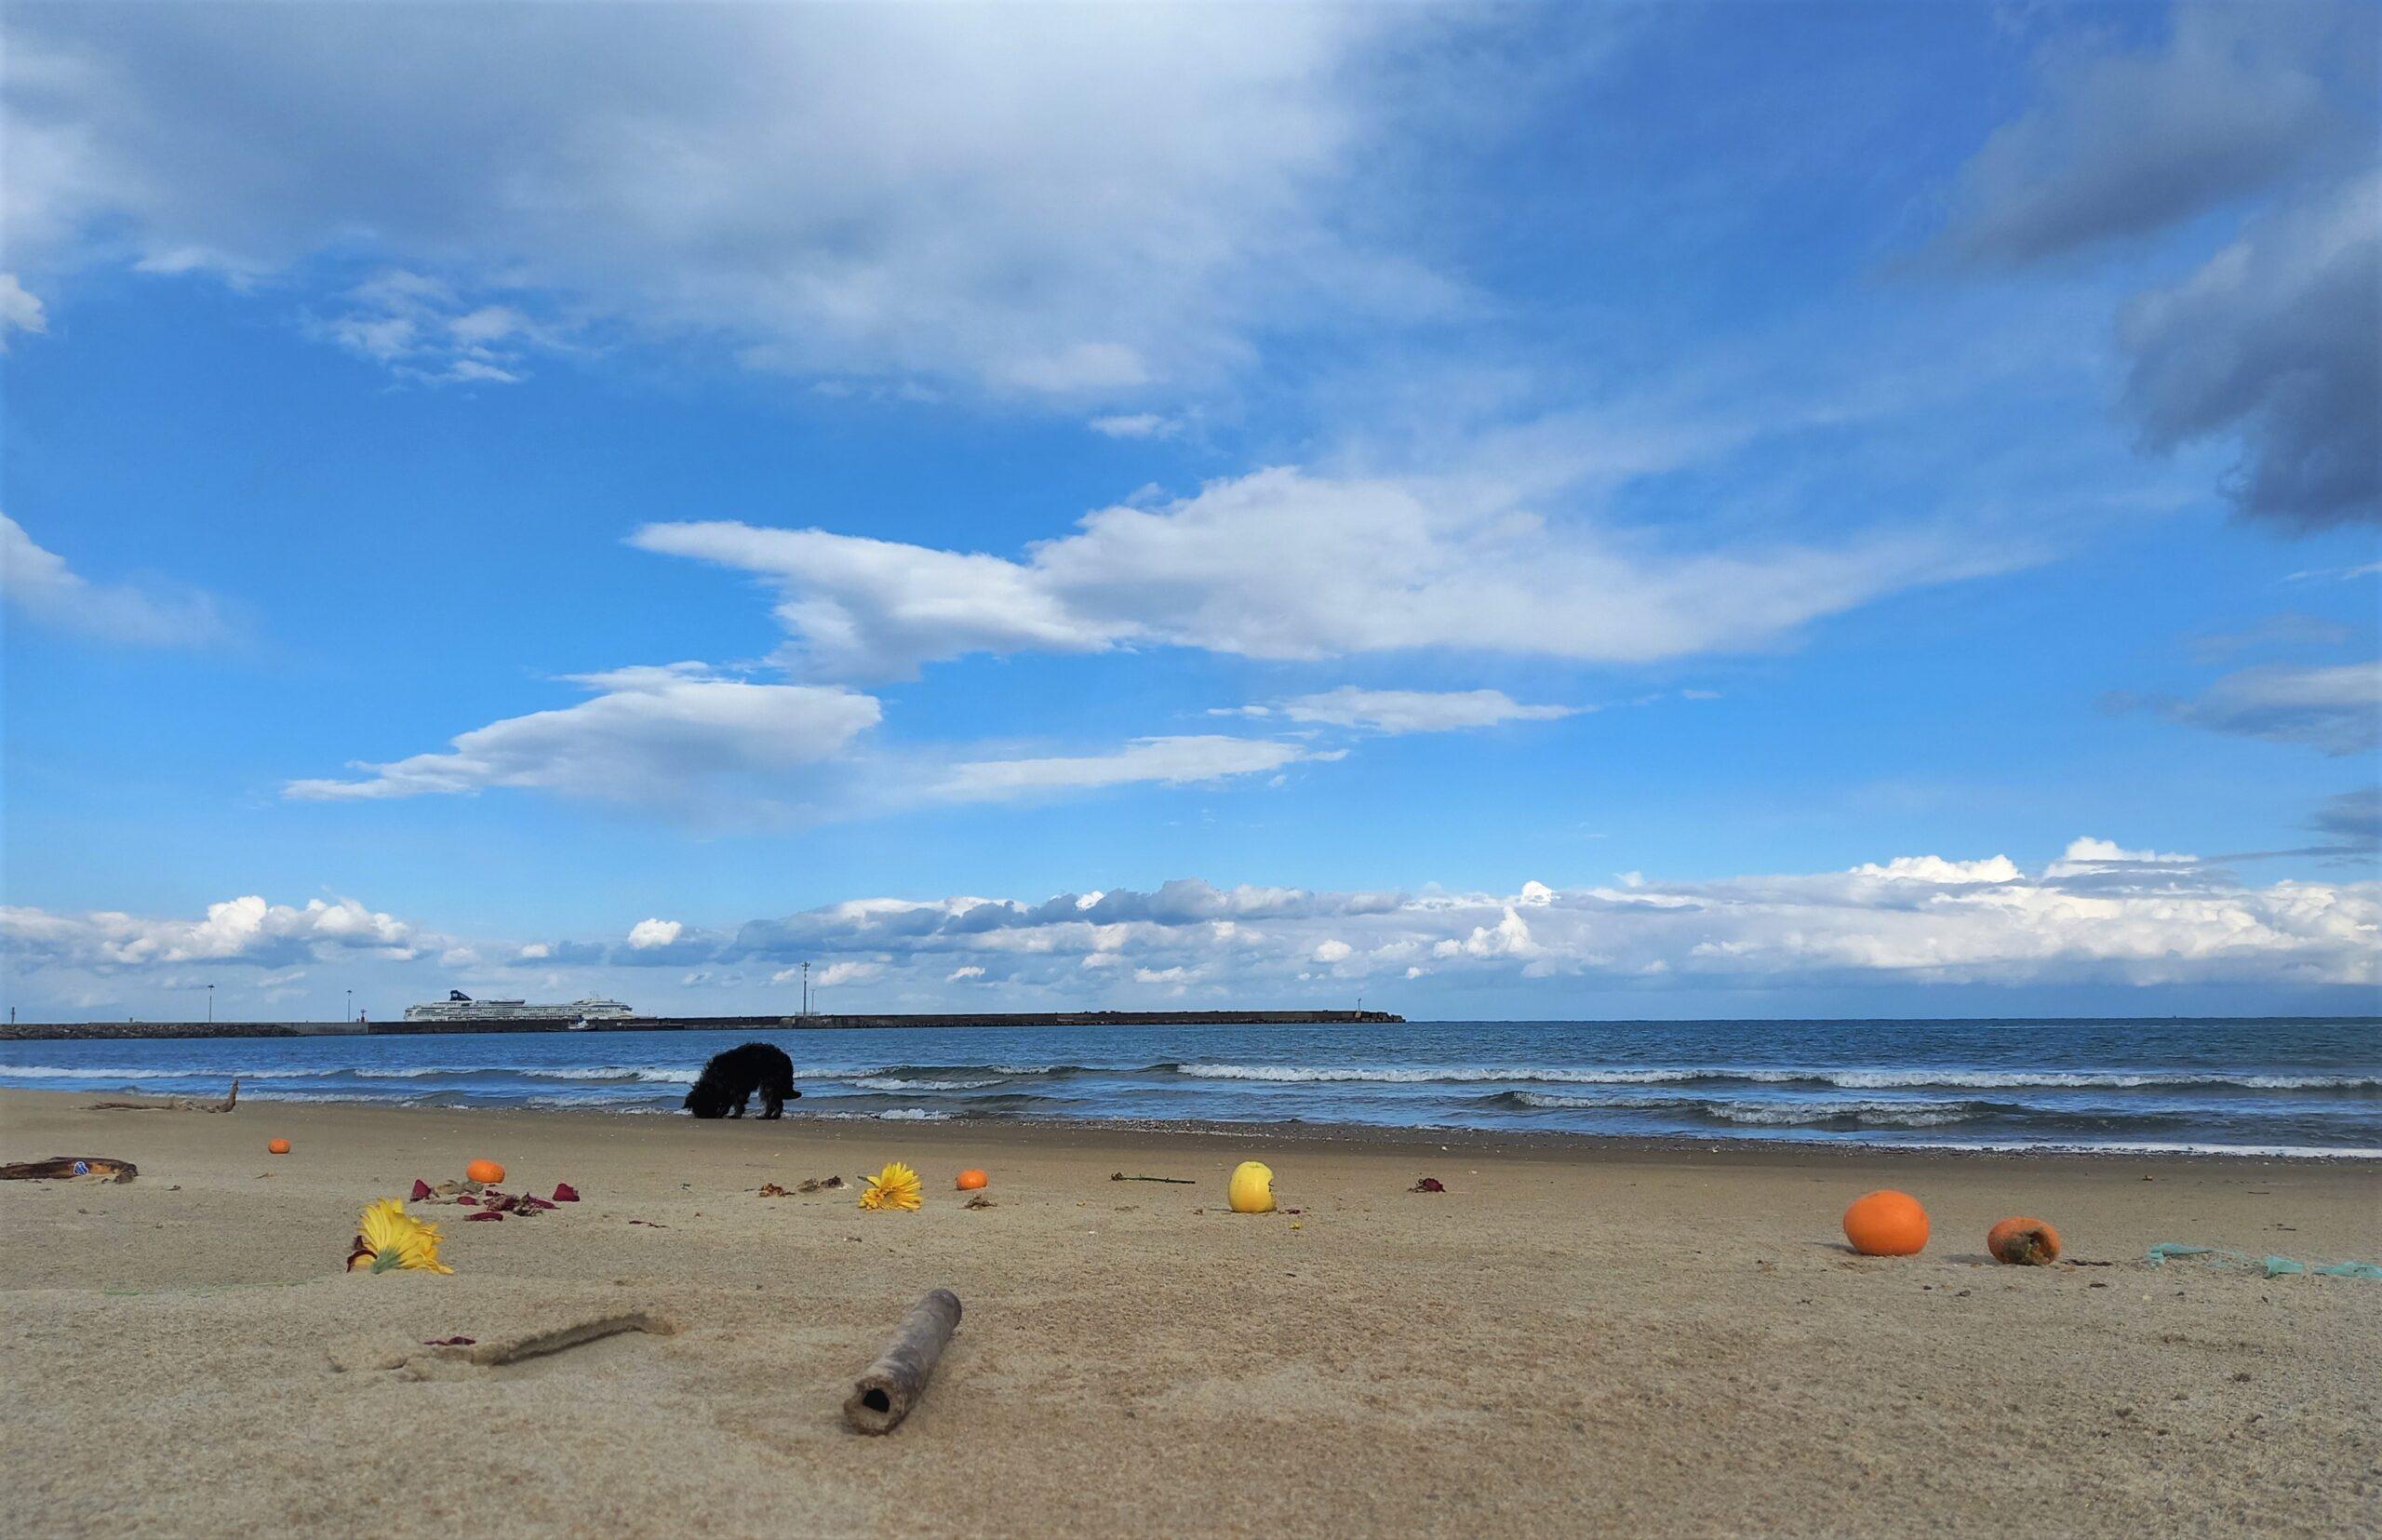 arte involontaria museo del mare playa catania